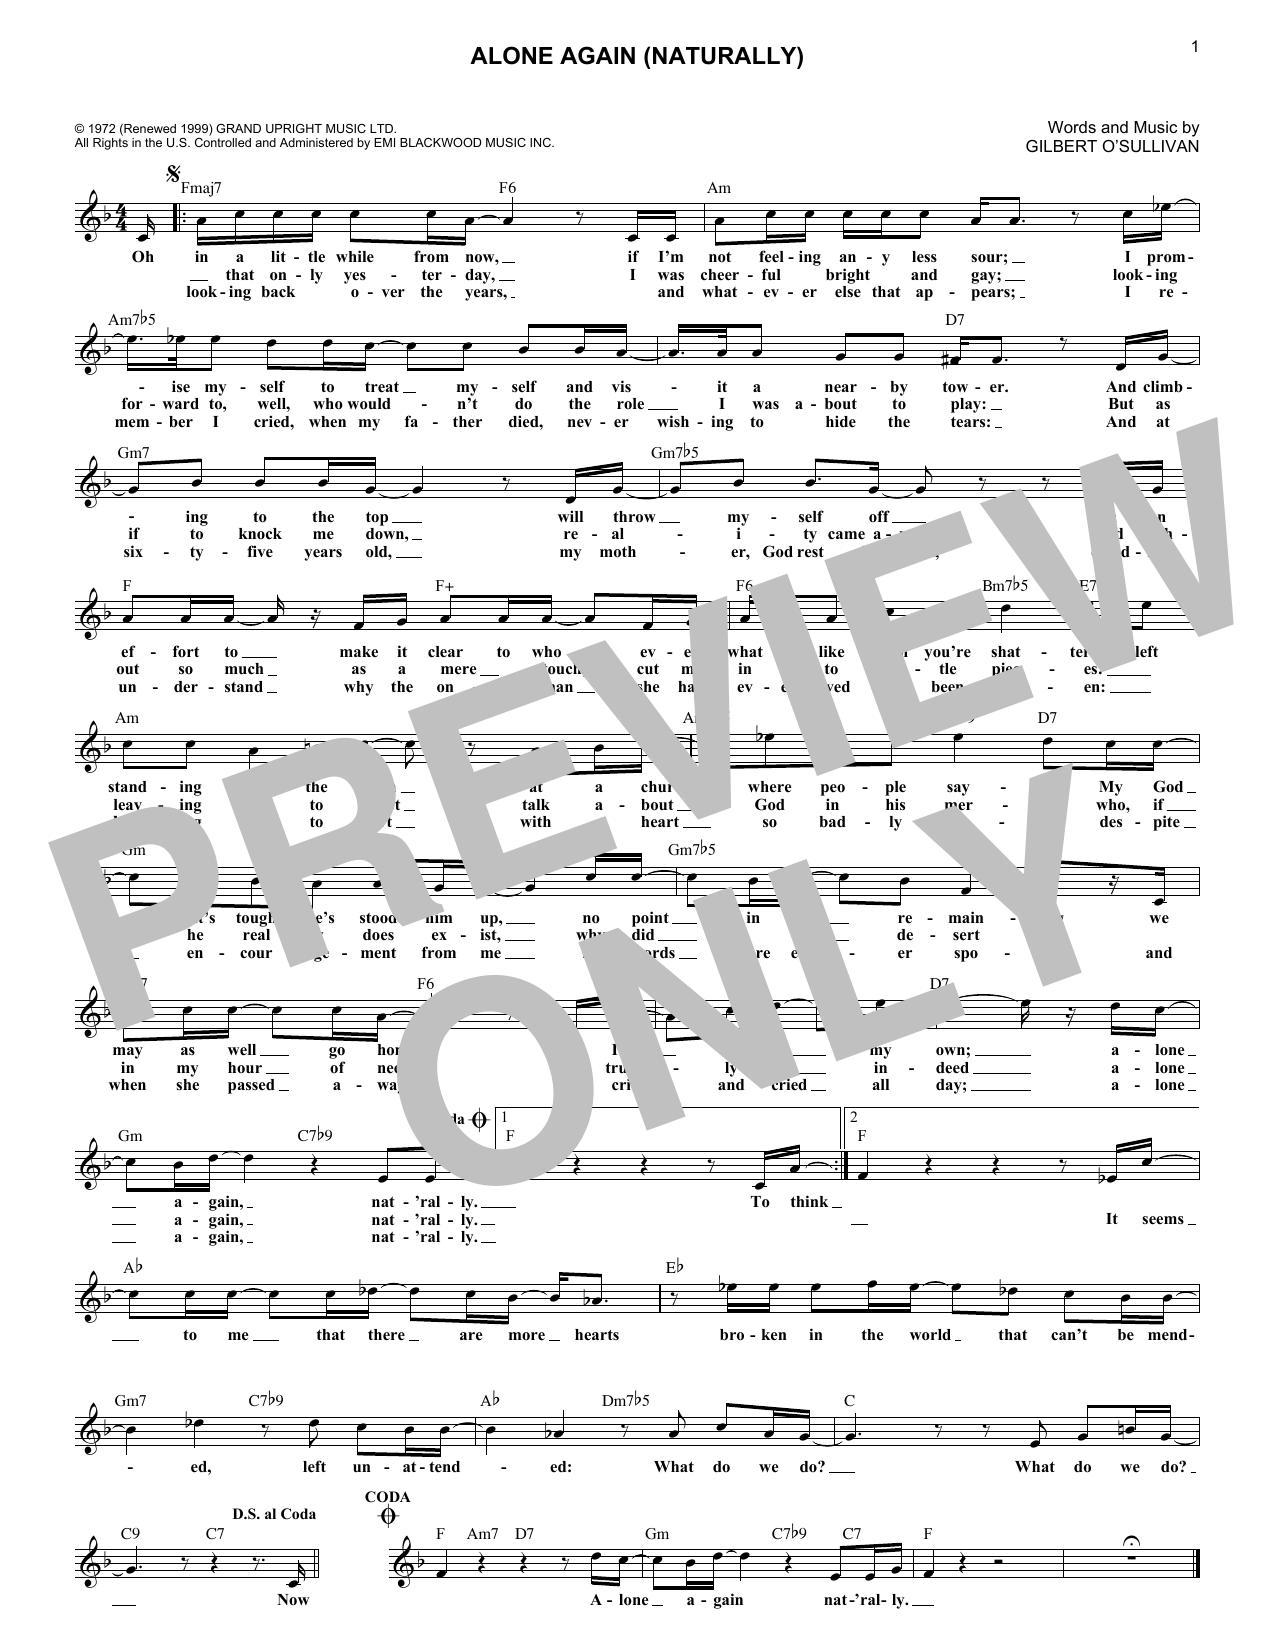 Sheet Music Digital Files To Print - Licensed Gilbert O